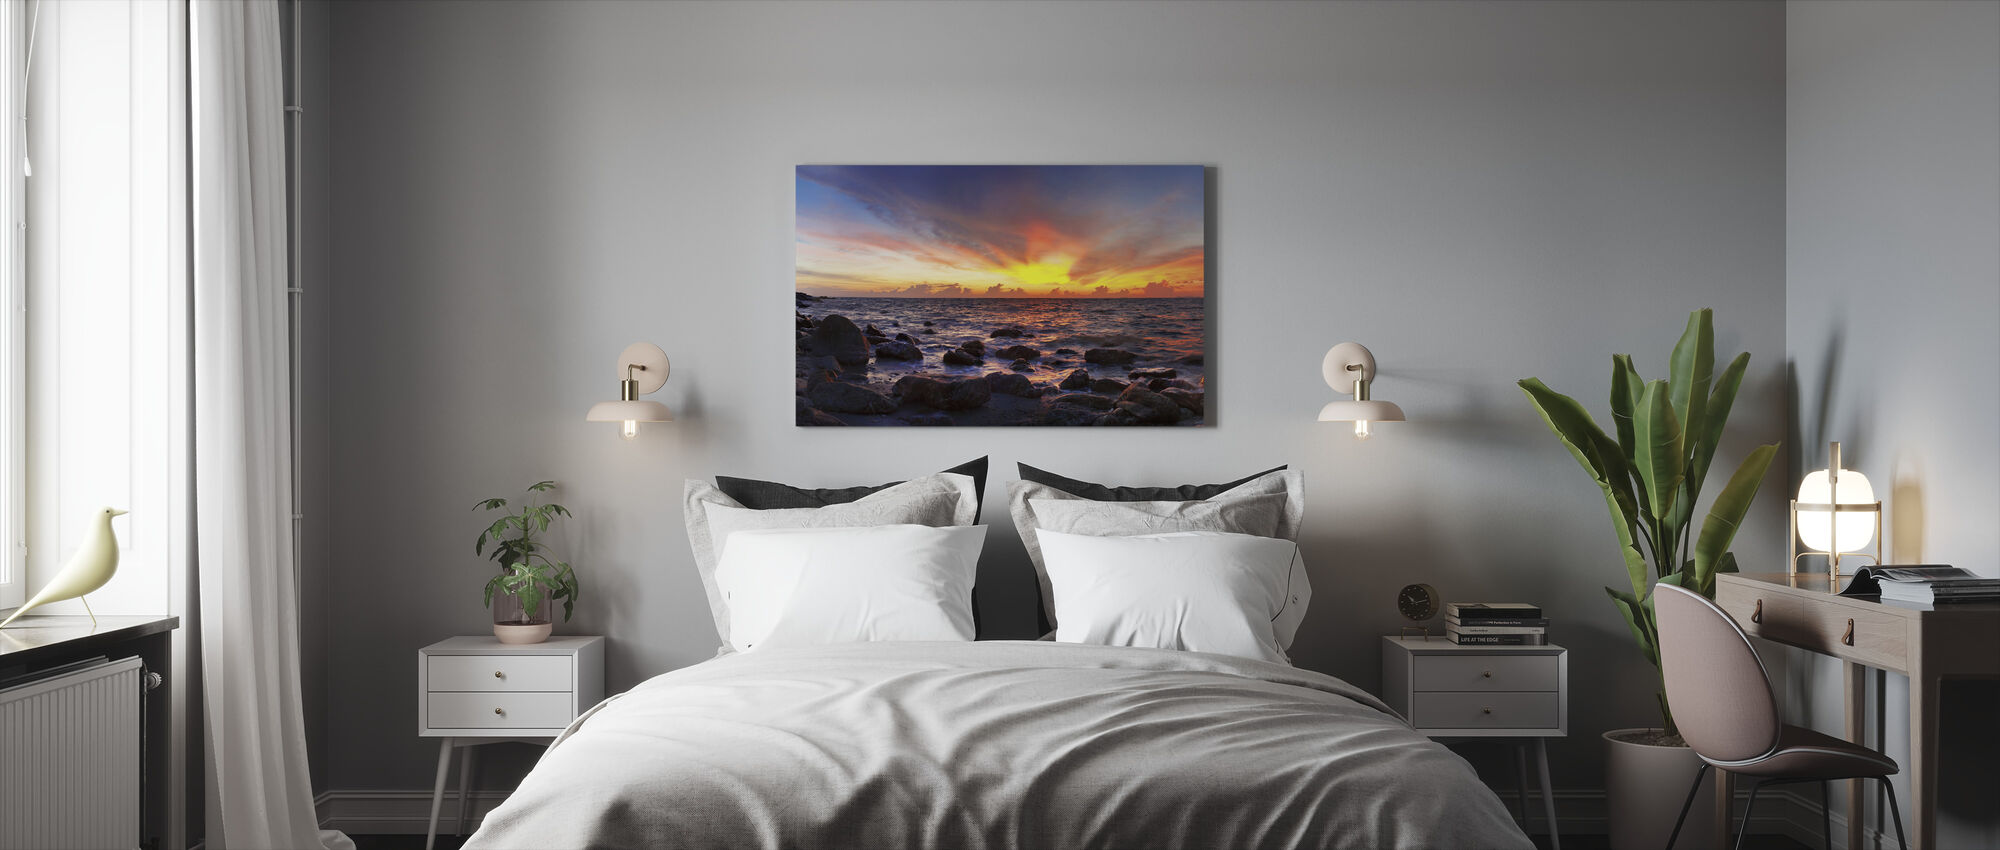 Wild Sunset - Canvas print - Bedroom